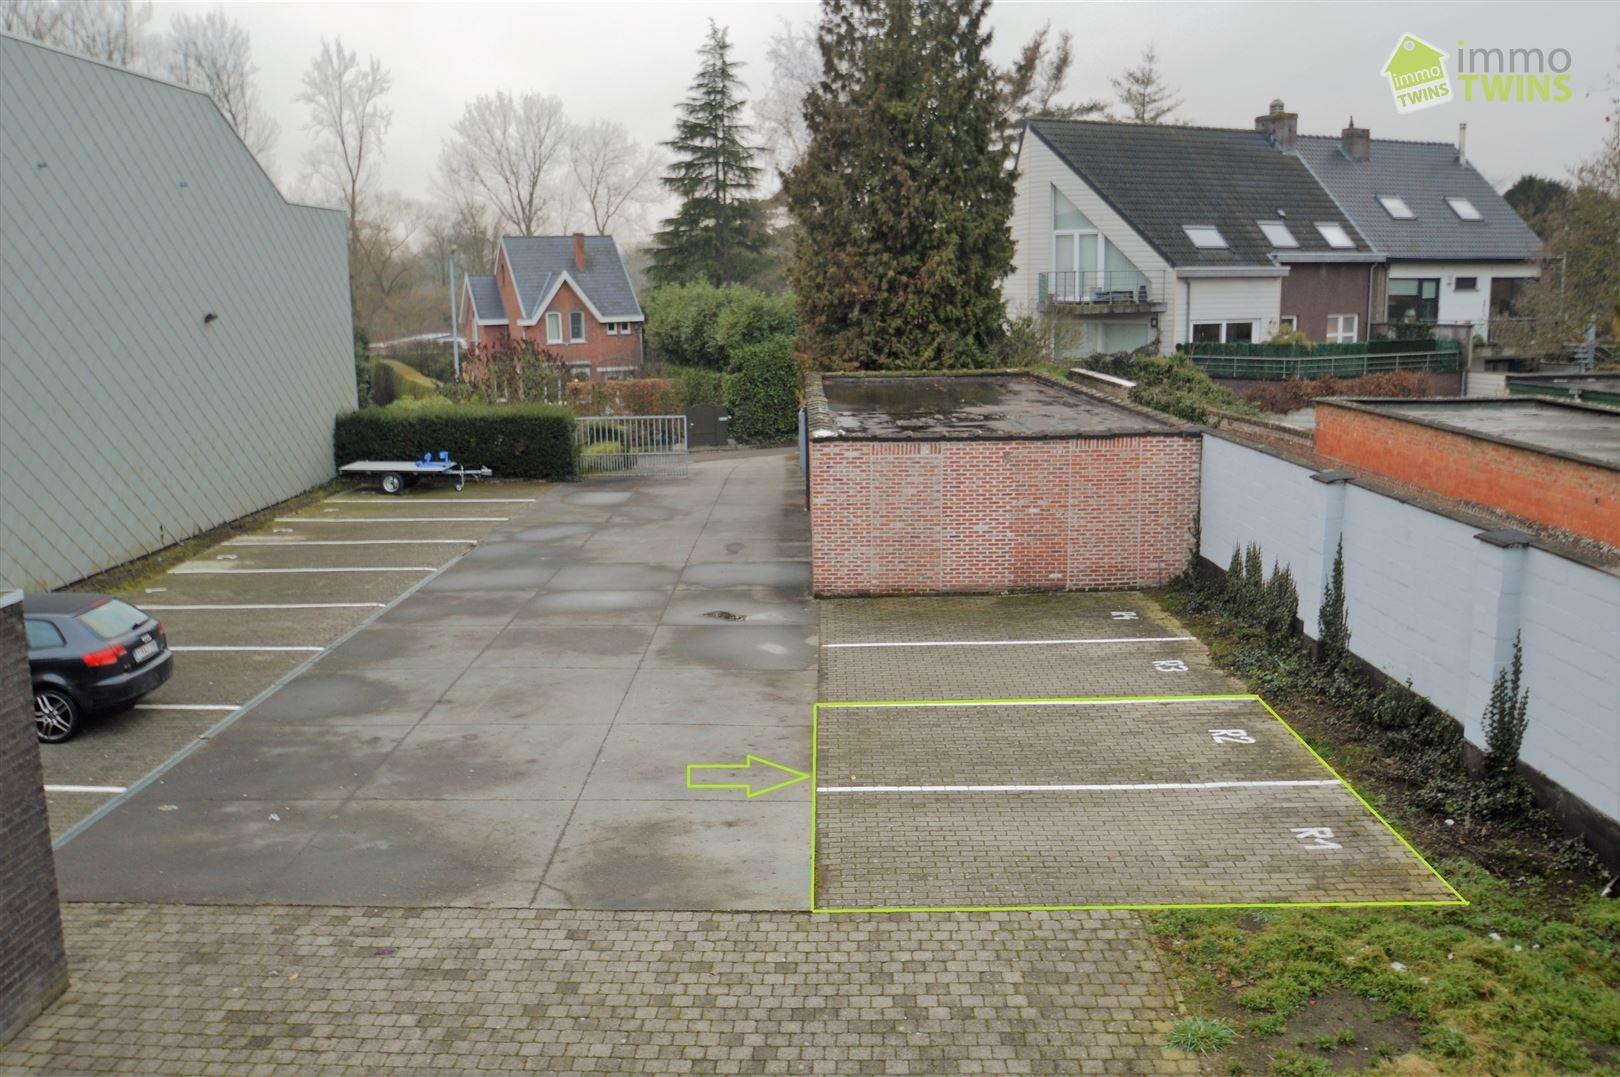 Foto 24 : Duplex/Penthouse te 2890 SINT-AMANDS (België) - Prijs € 429.000